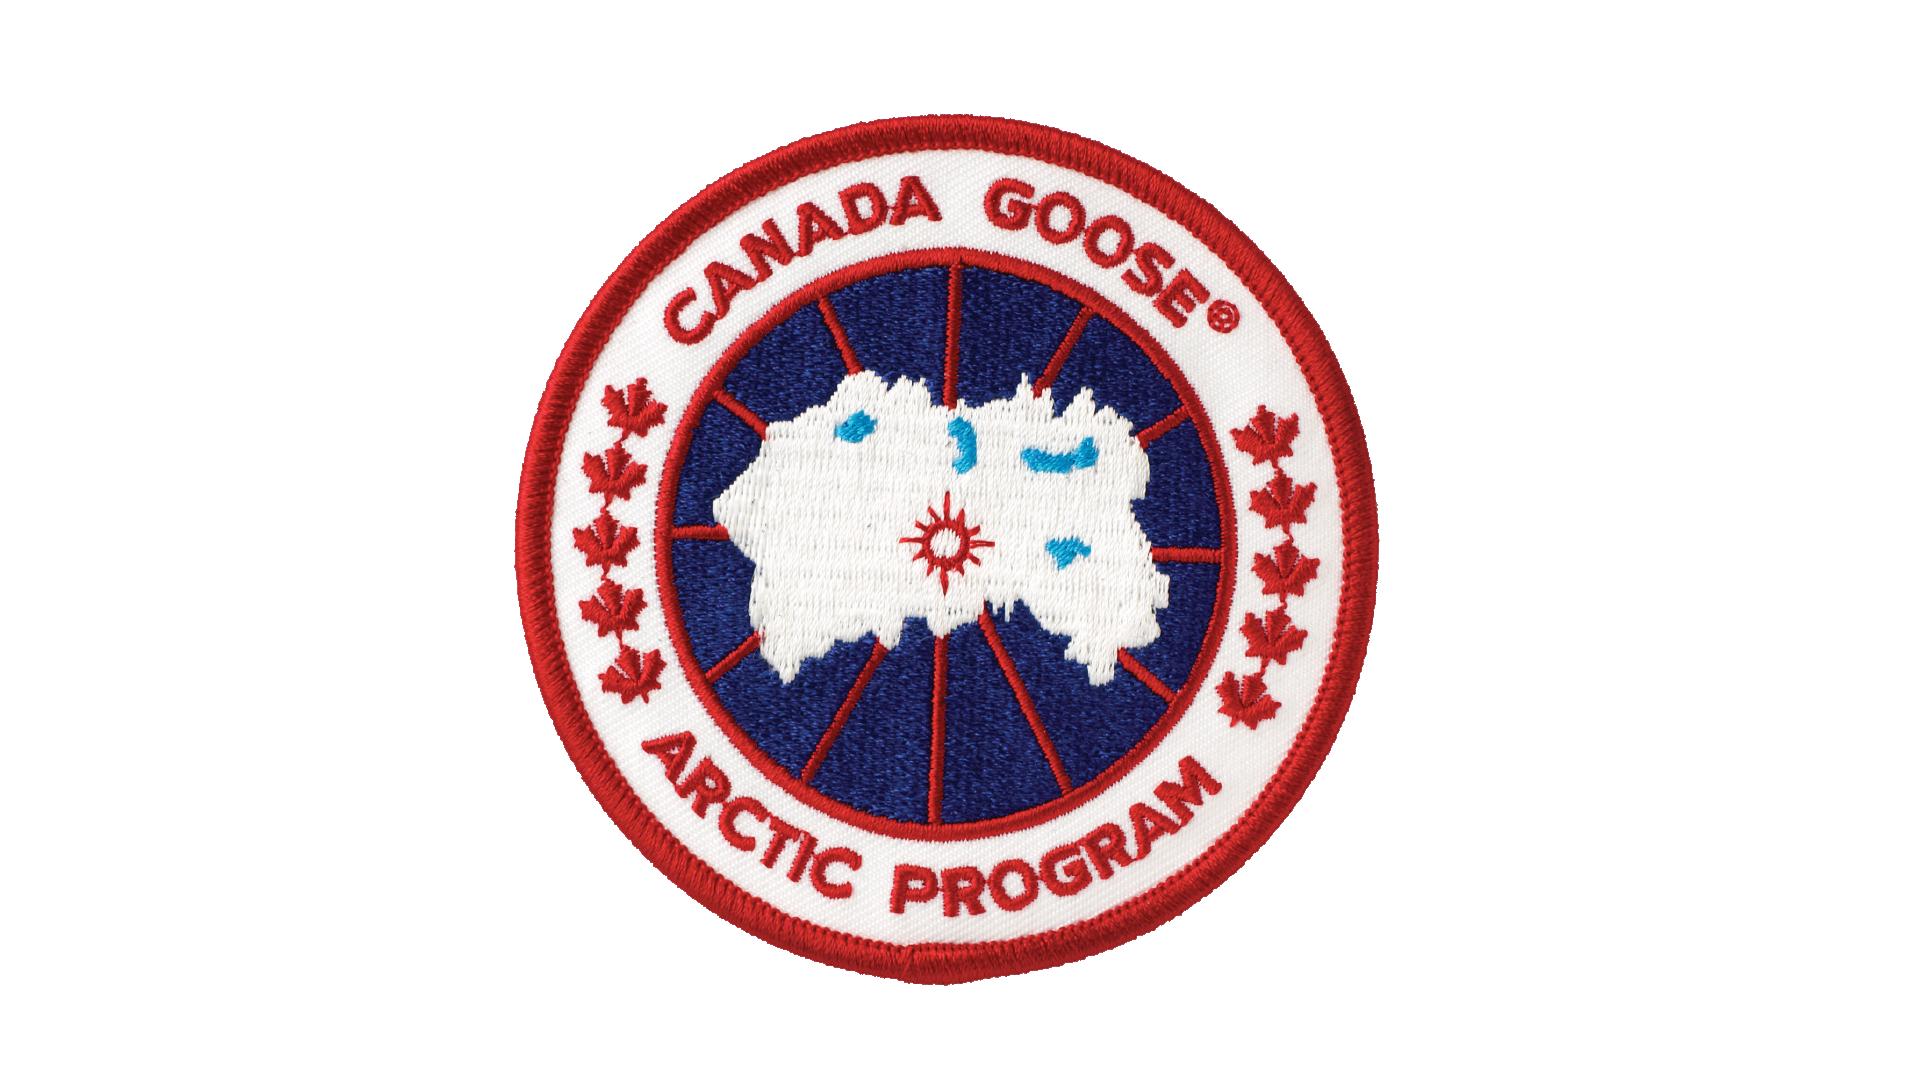 Goose clipart icon canadian. Canada symbol